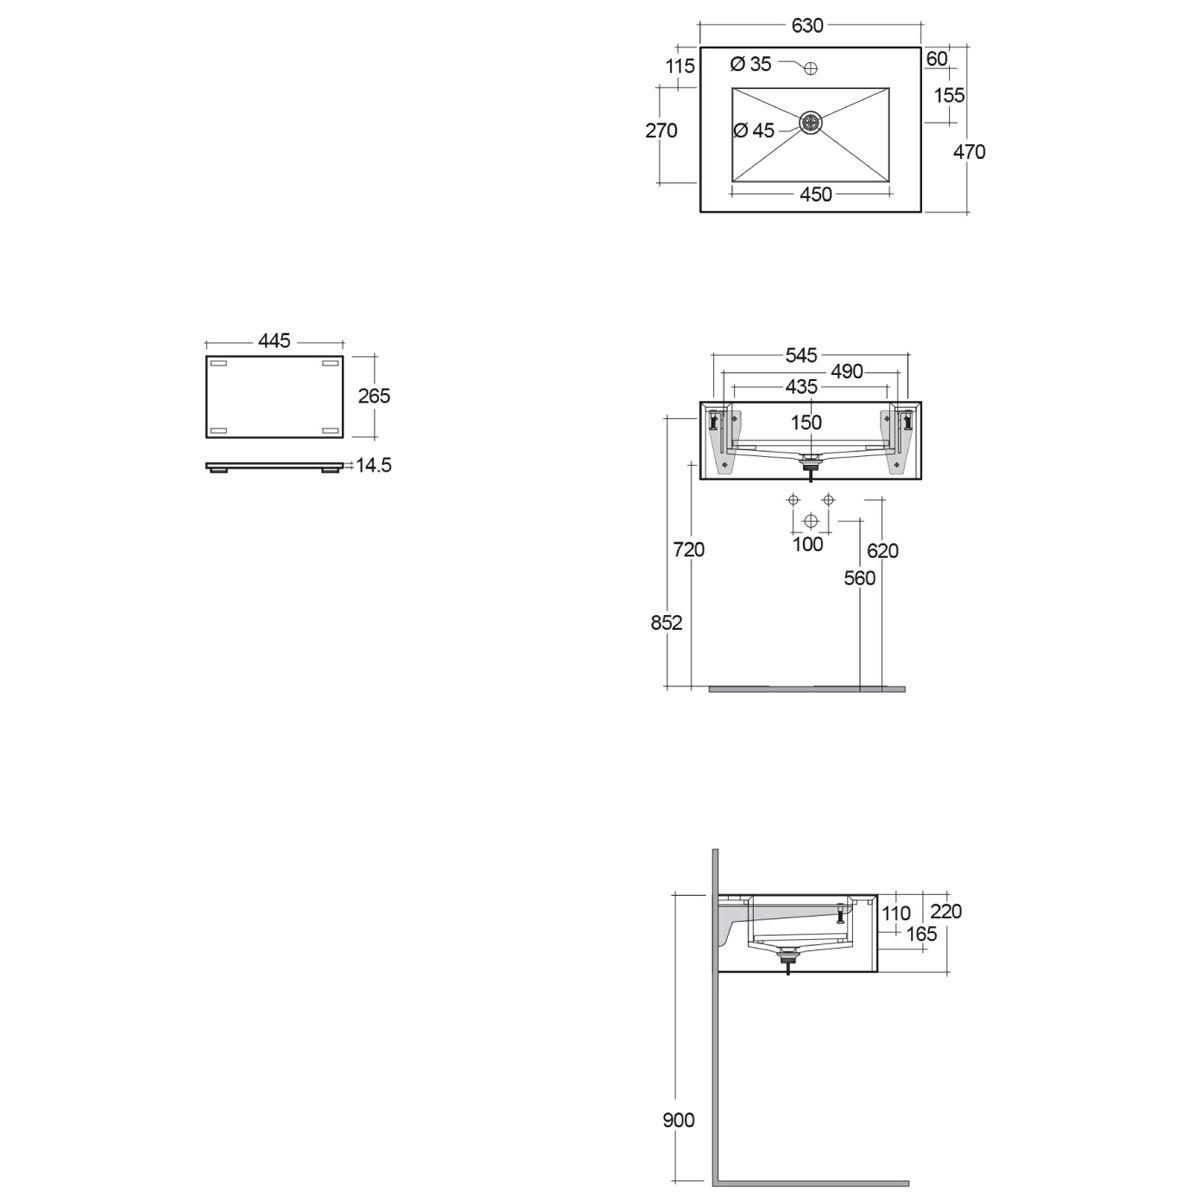 RAK Precious Carrara Wall Hung Counter Basin with Bracket Measurements